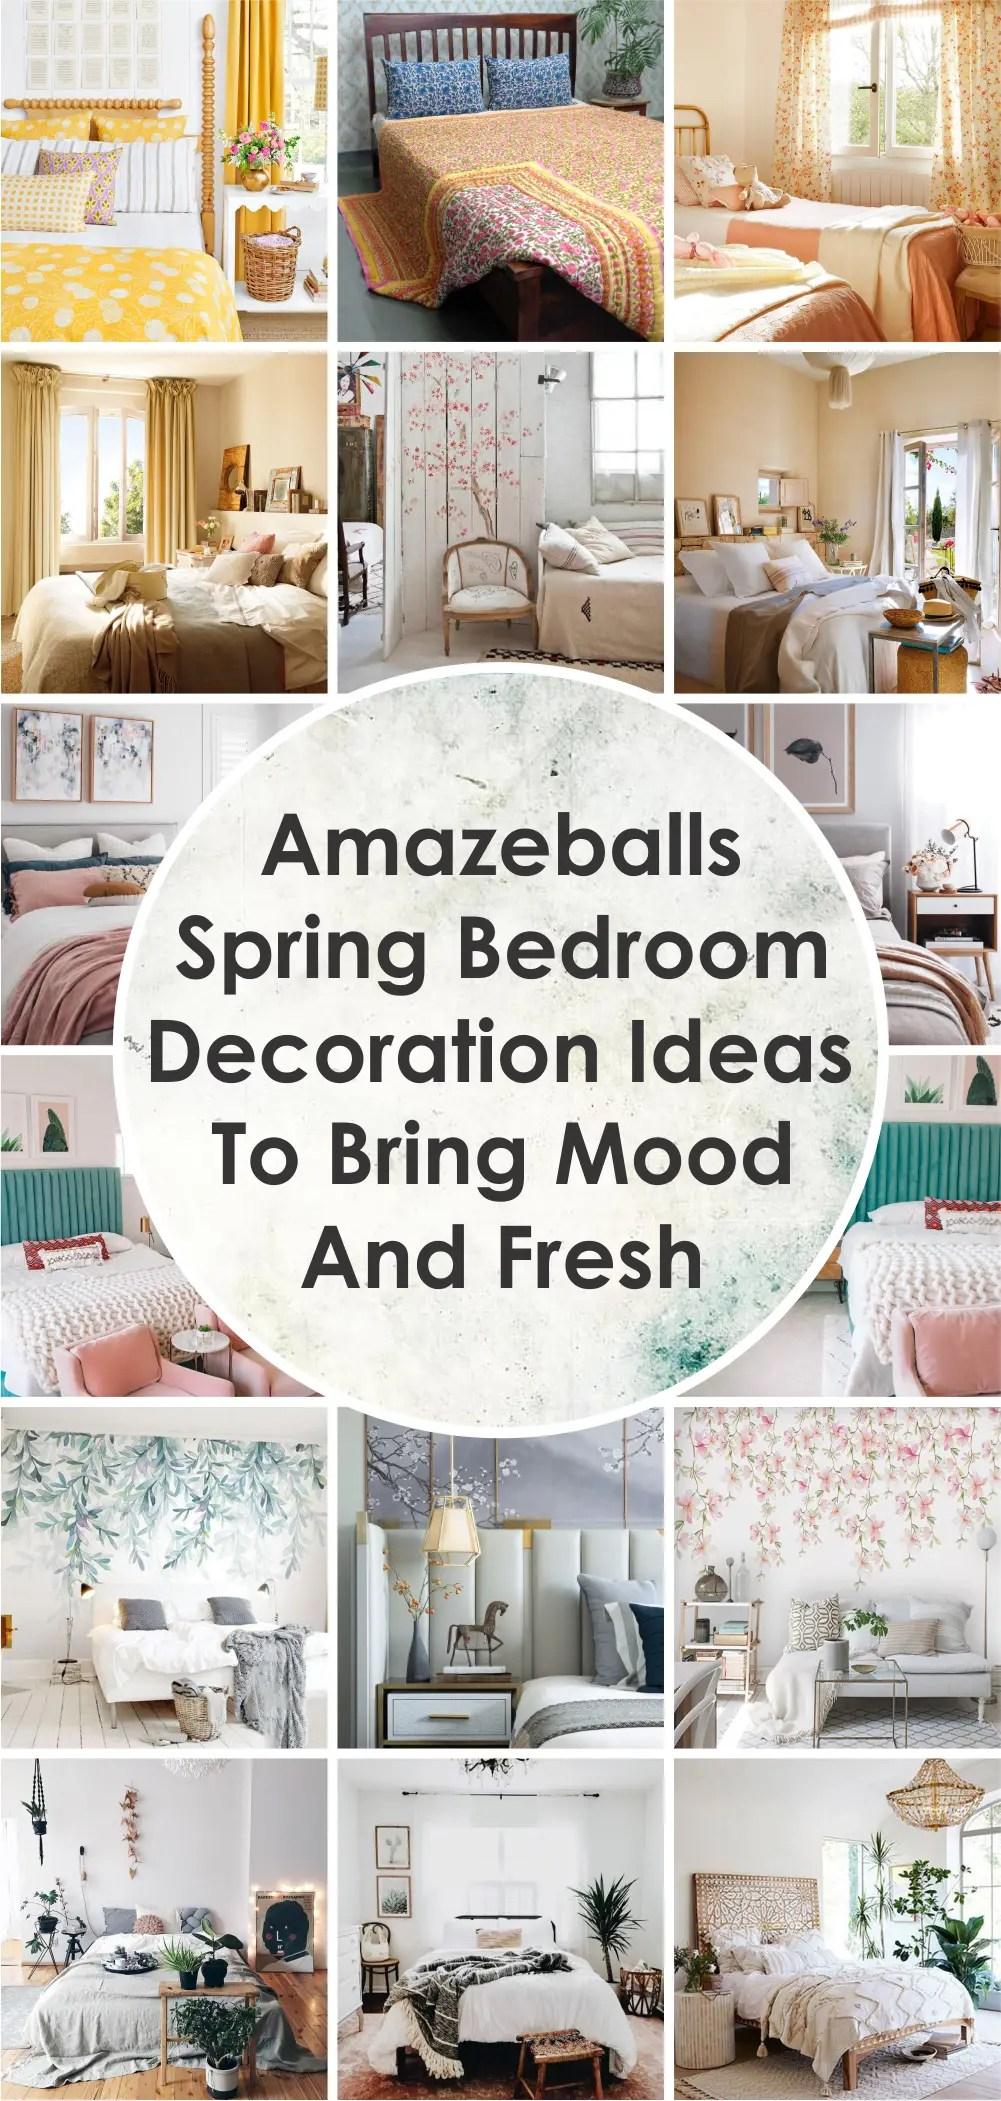 Amazeballs-spring-bedroom-decoration-ideas-to-bring-mood-and-fresh-1